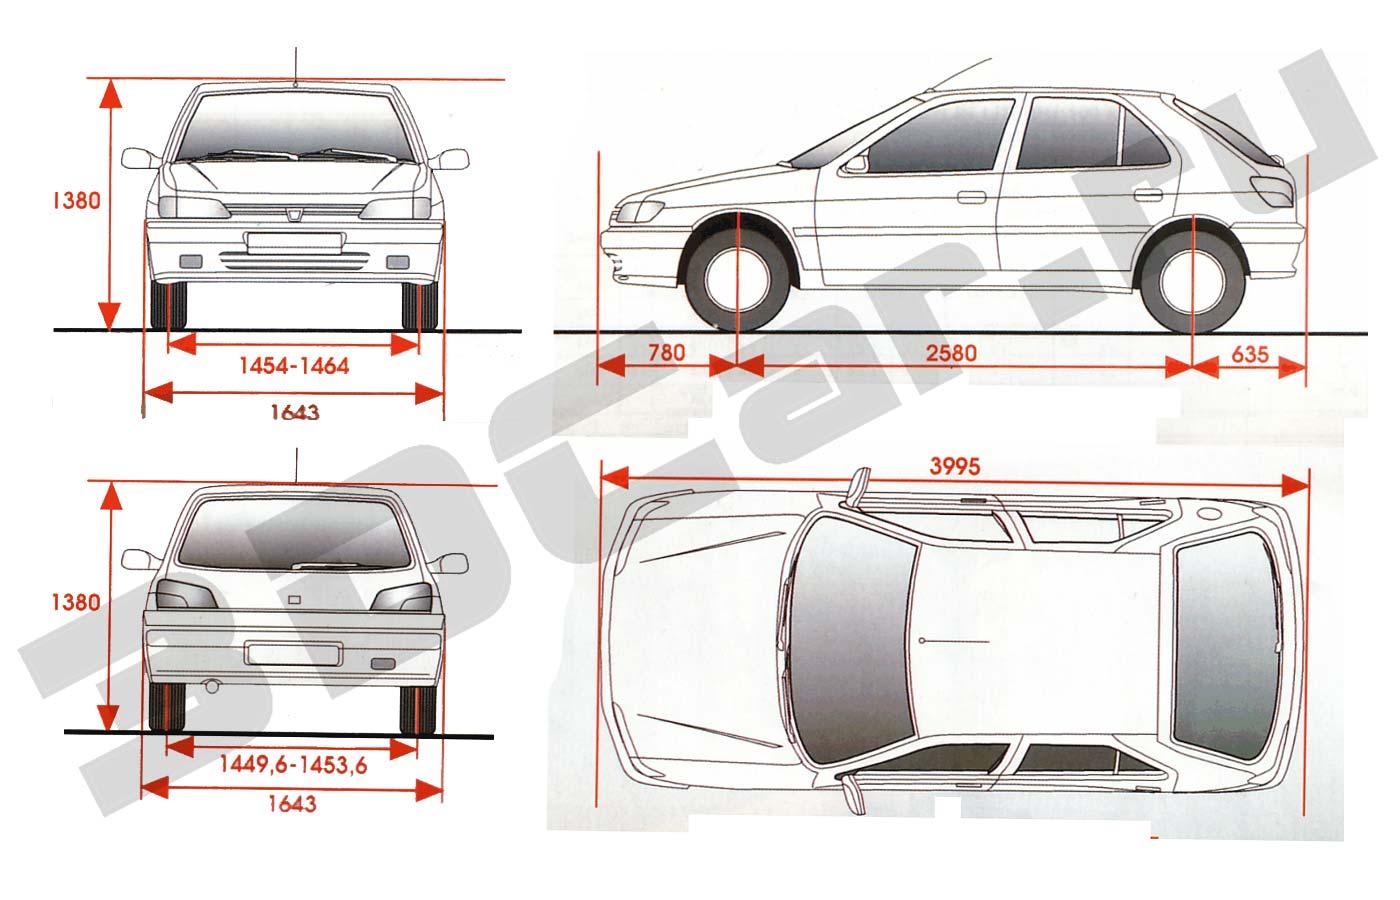 306oc peugeot 306 owners club forum 306 handbook pdf rh 306oc co uk Peugeot 5008 Peugeot 306 Karavan